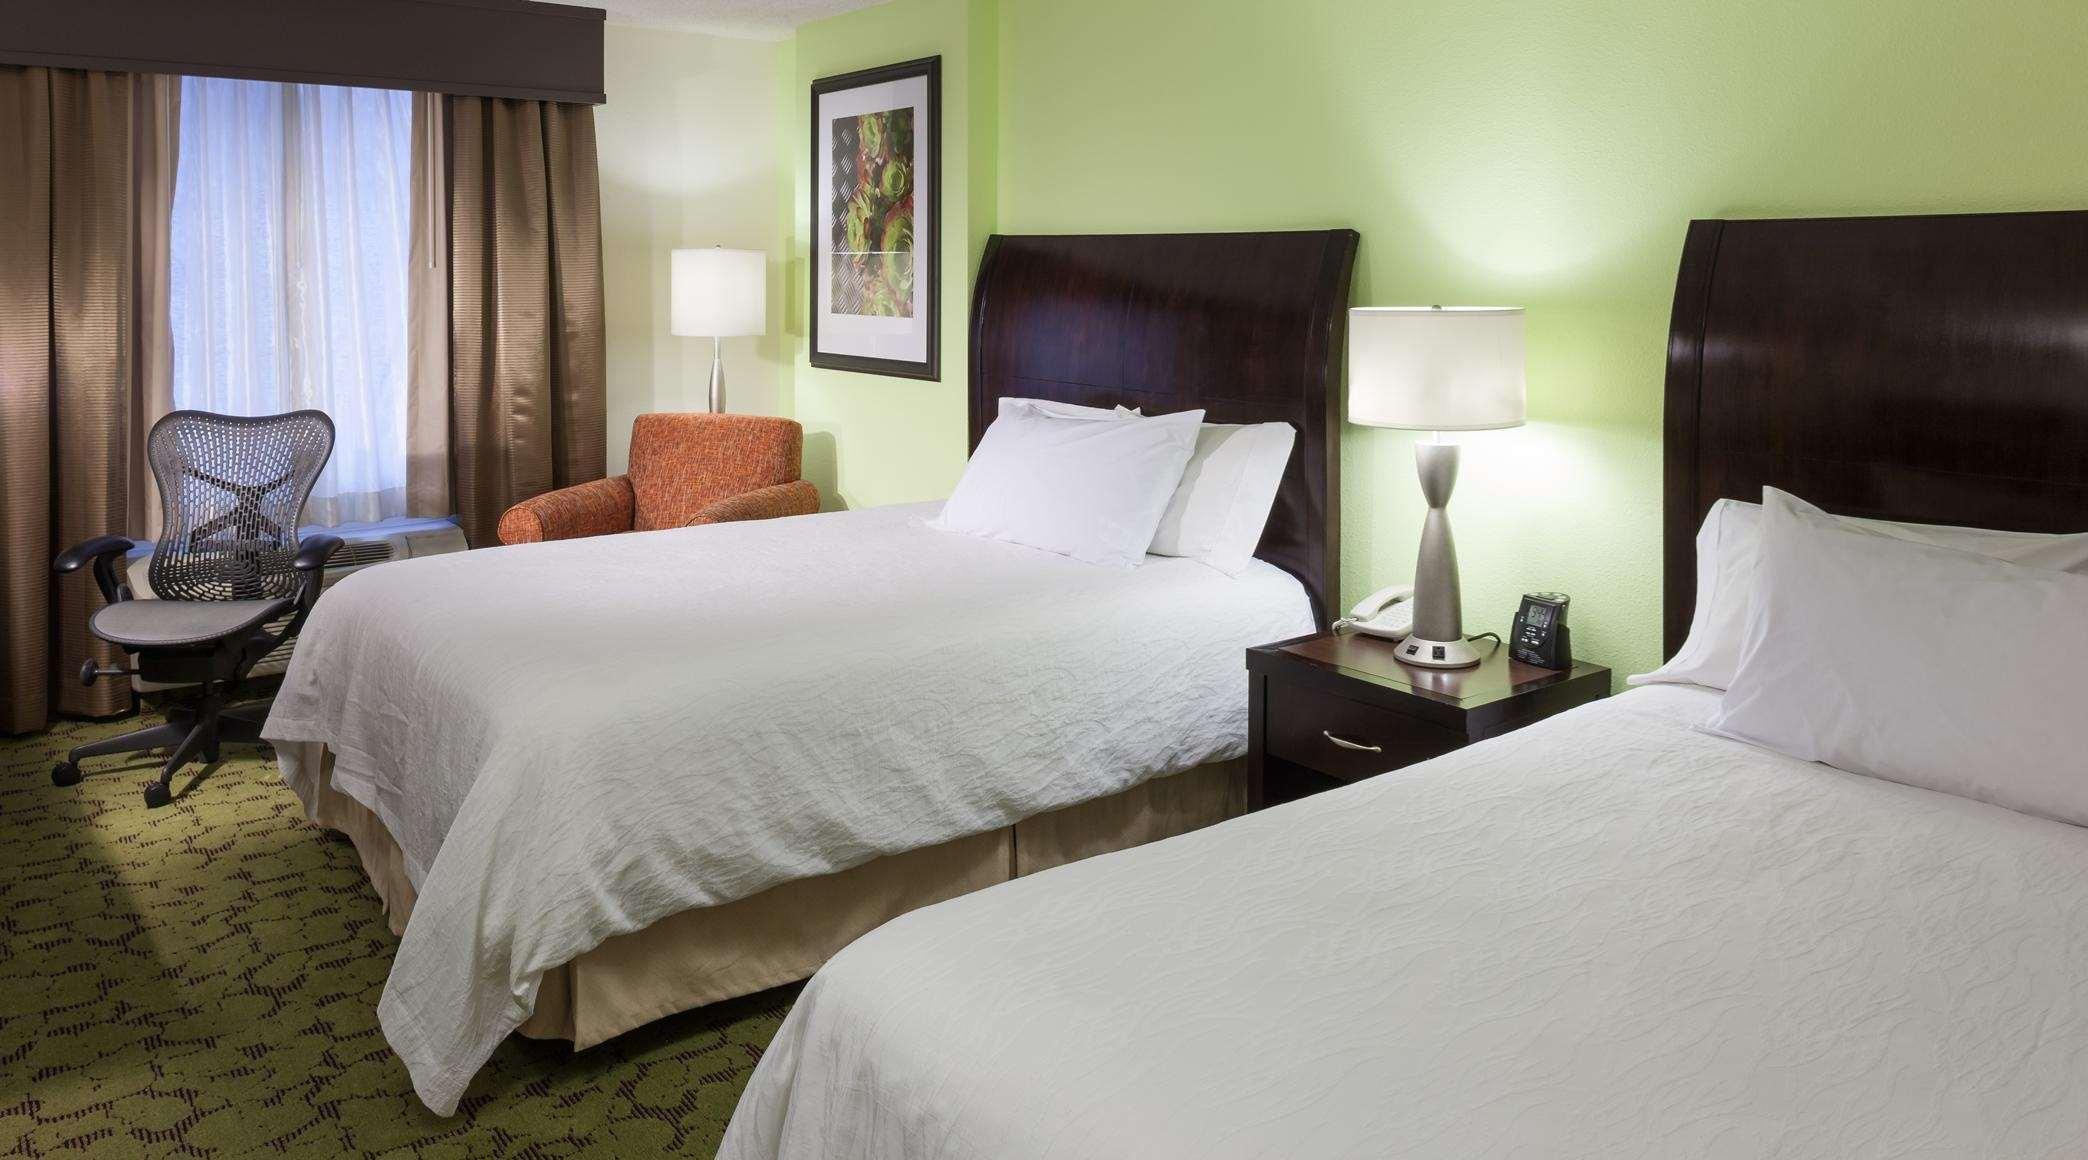 Hilton Garden Inn Denver/Highlands Ranch image 29